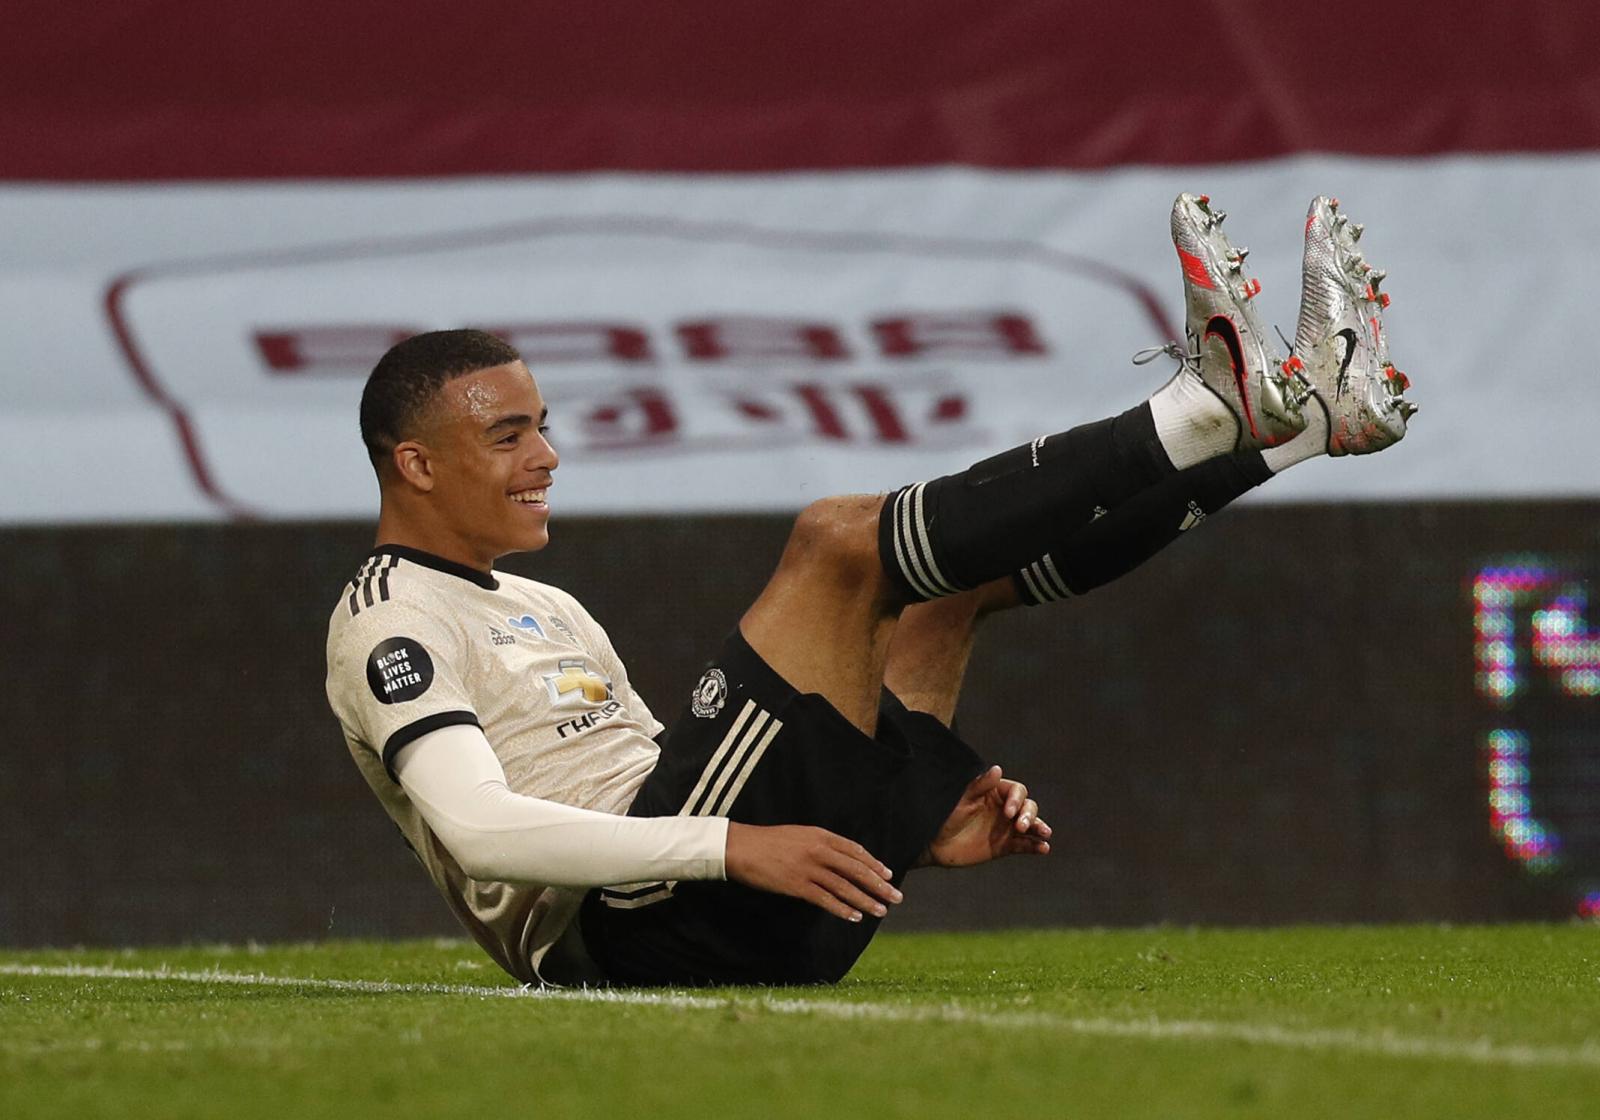 Манчестер Юнайтед — Саутгемптон: прогноз на матч 35-го тура АПЛ